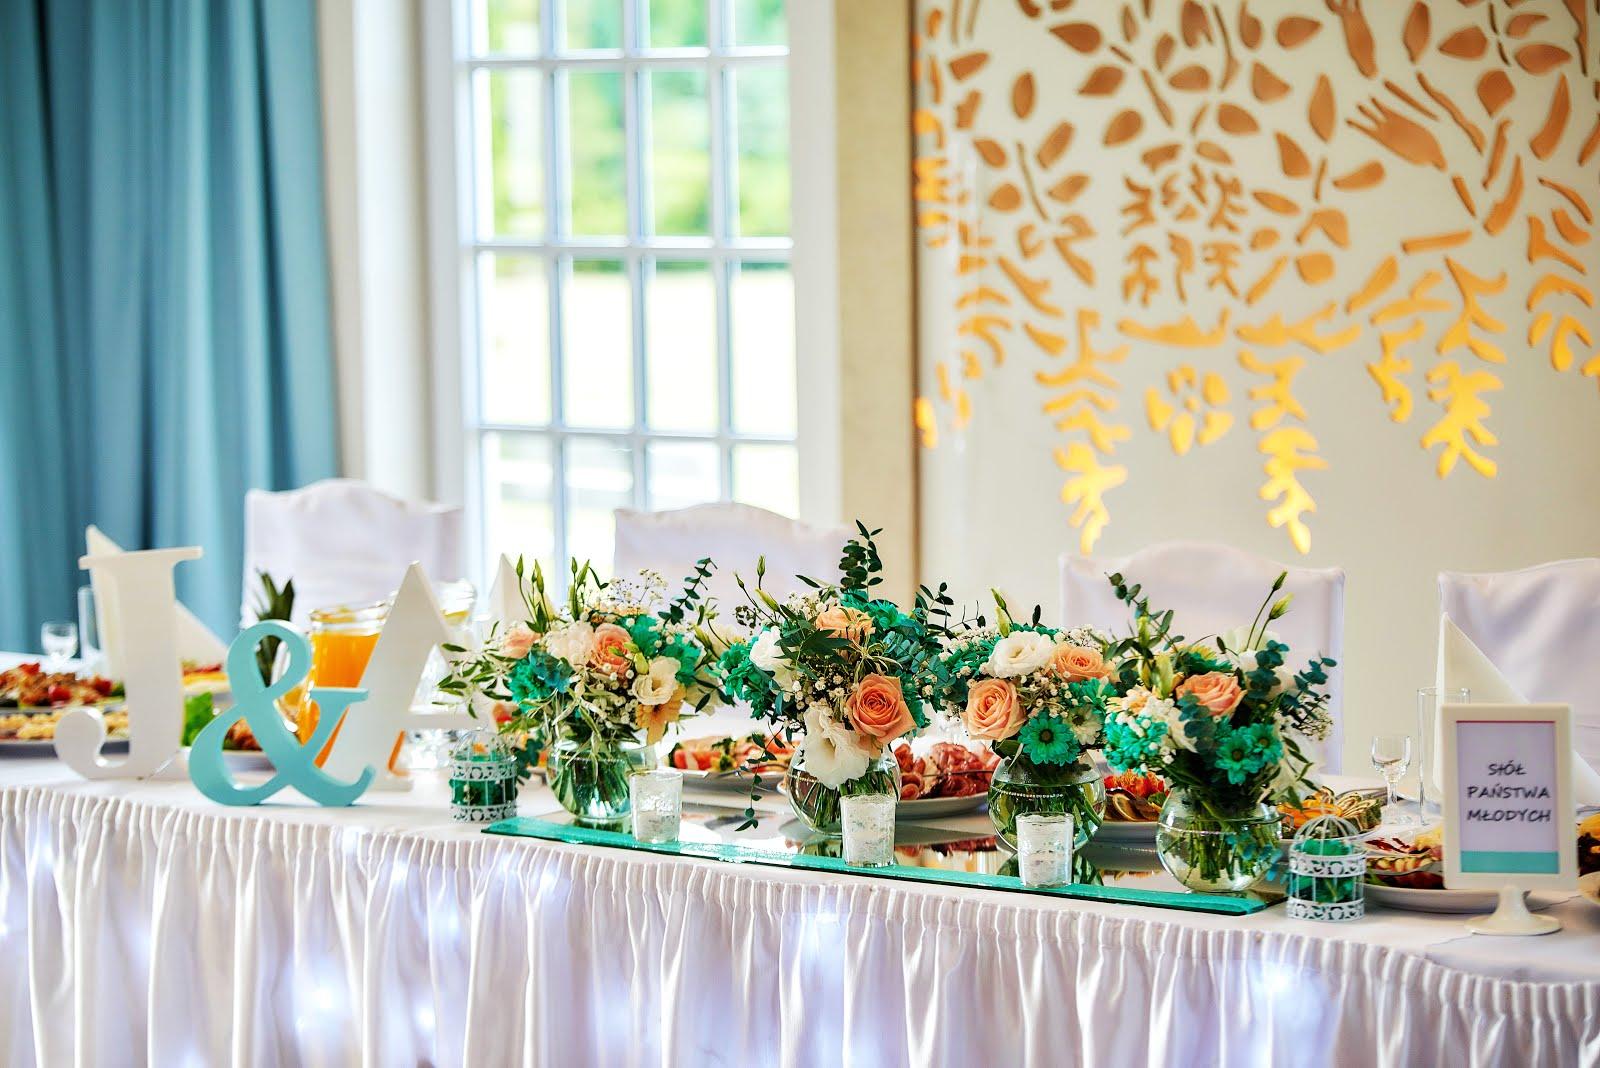 stol_panstwa_mlodych_dekoracja